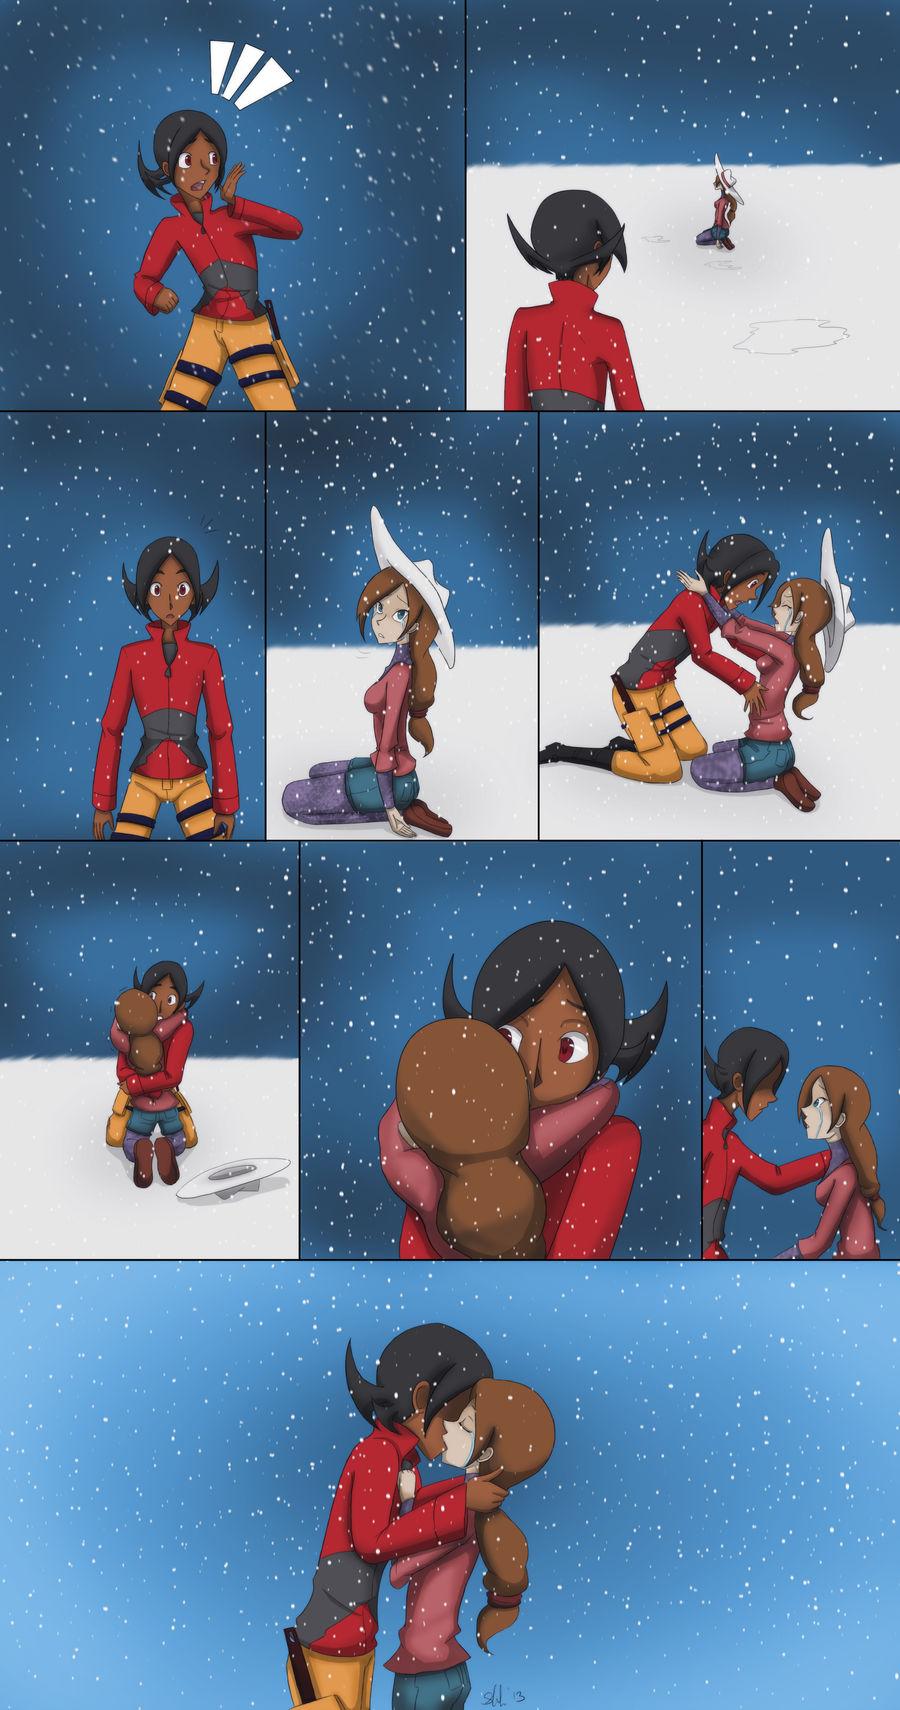 Christmas-ish....yes